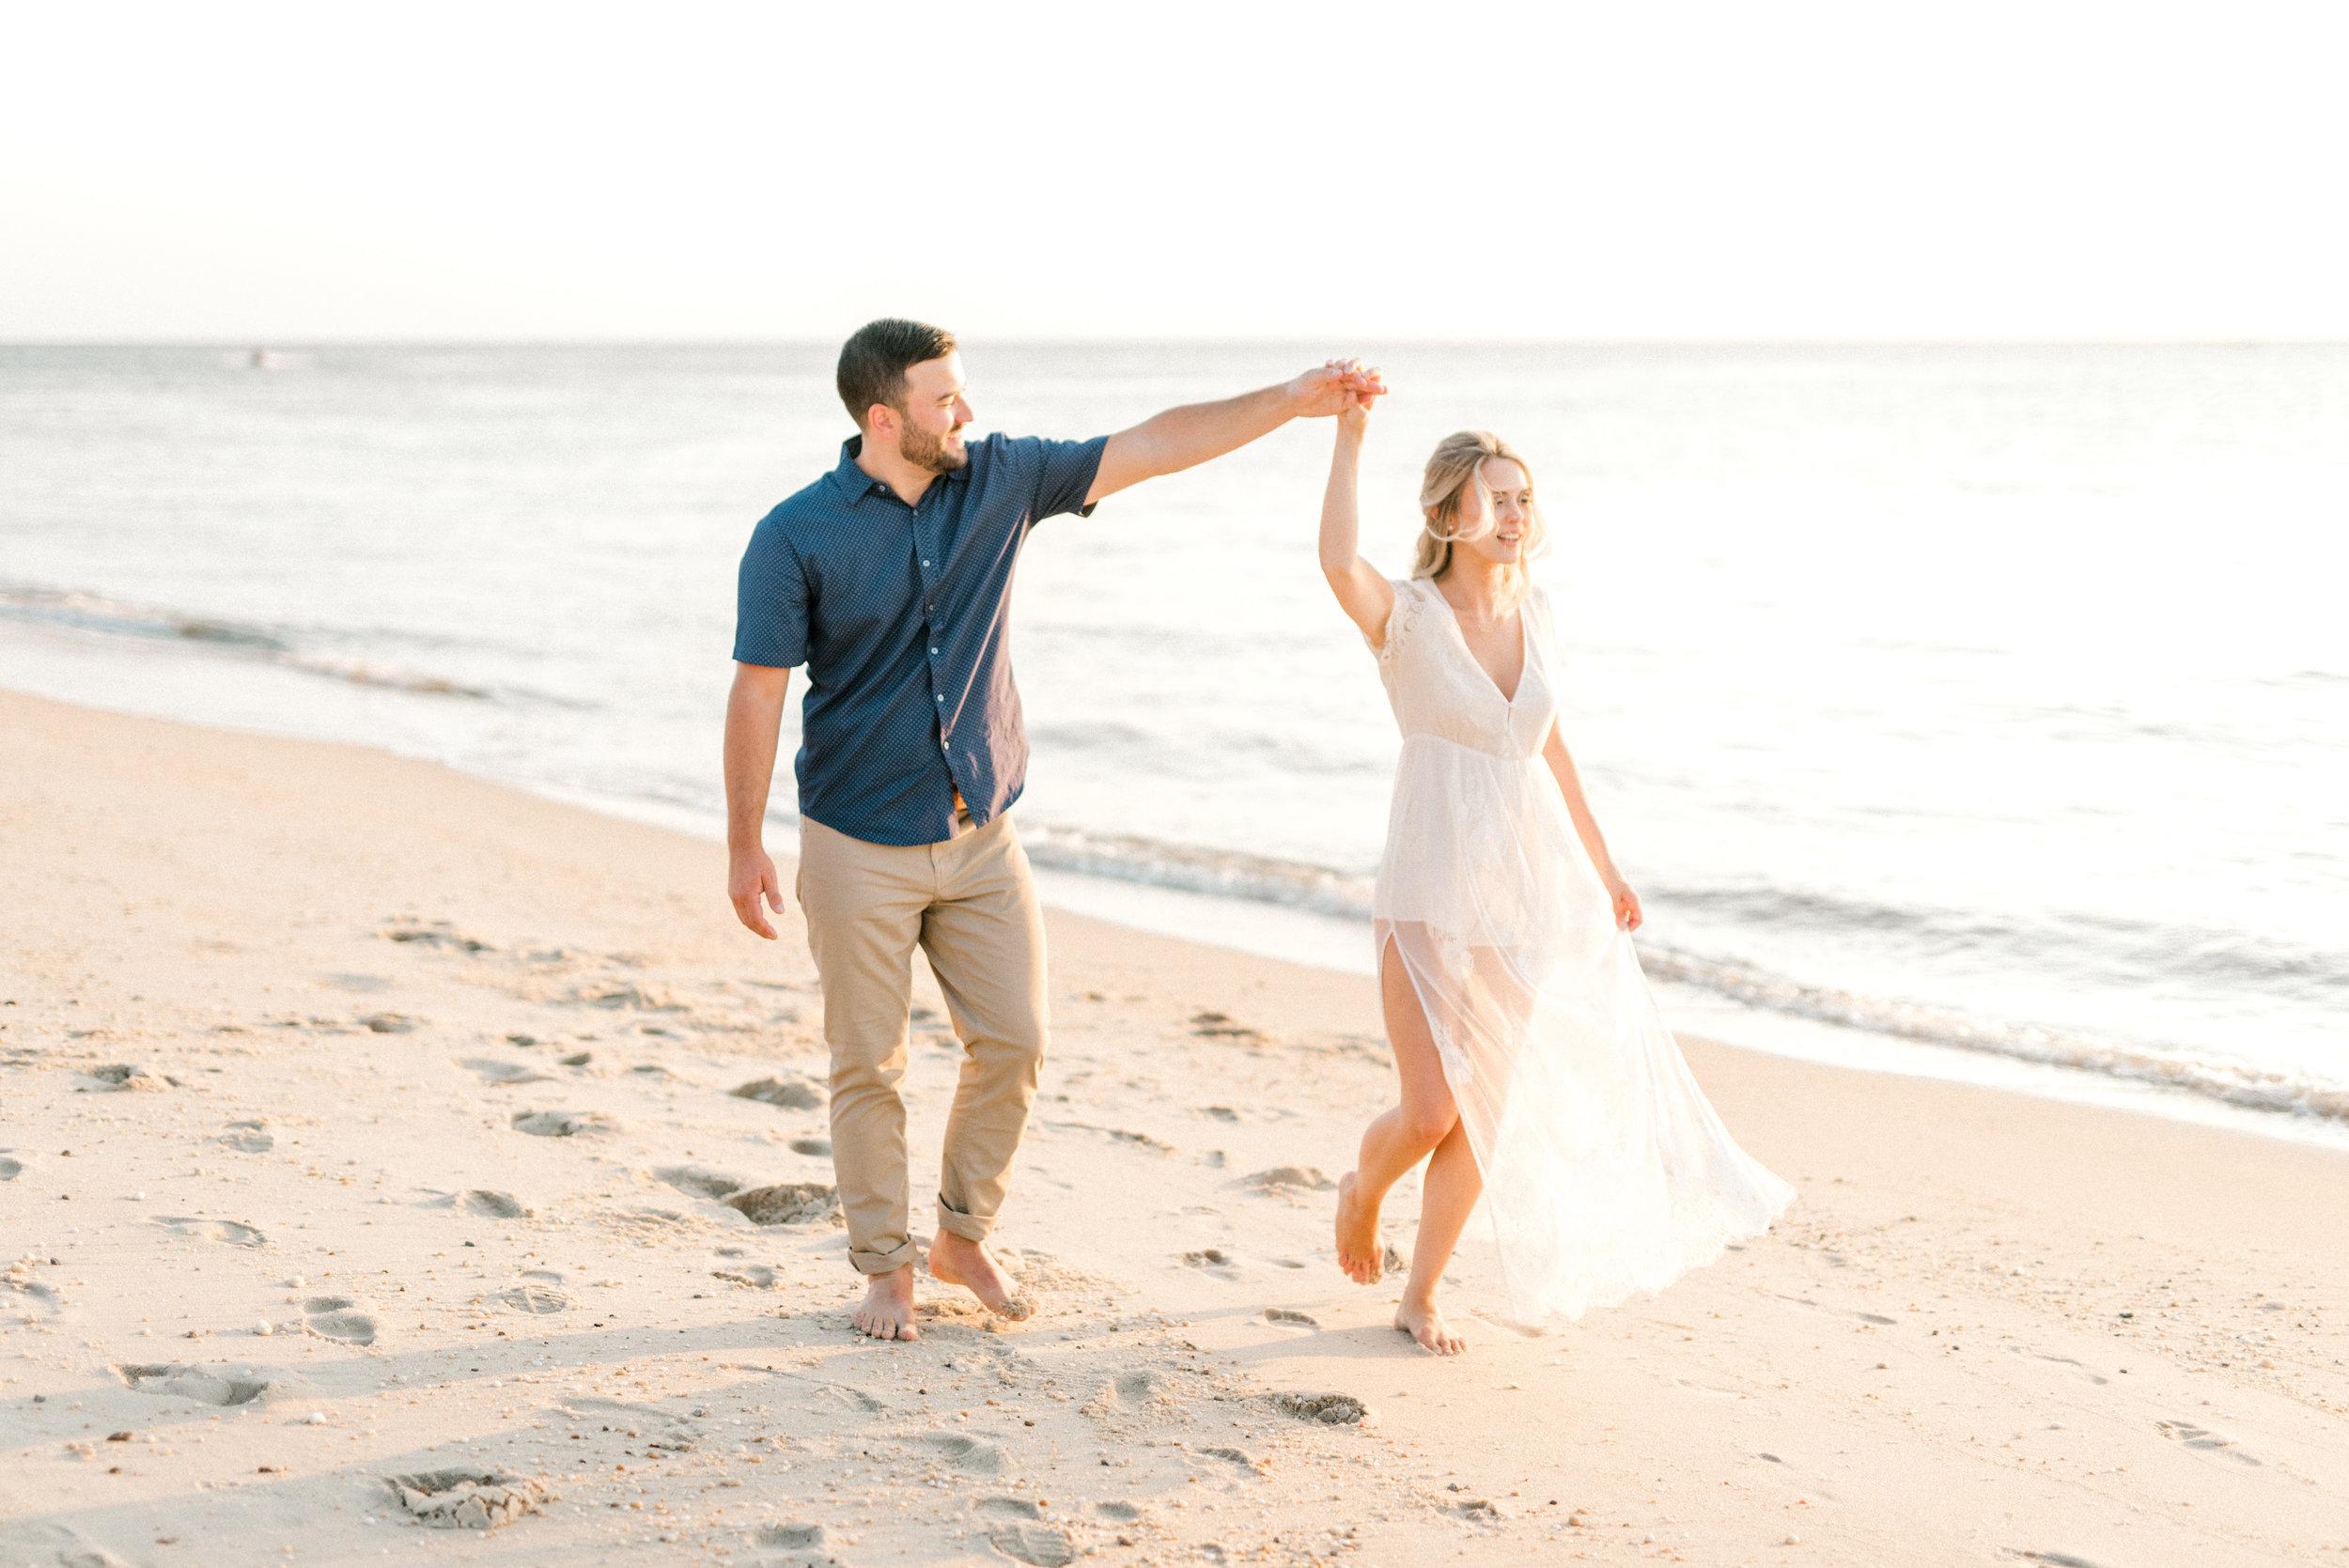 cape-may-beach-engagement-photos-haley-richter-photography-036.jpg